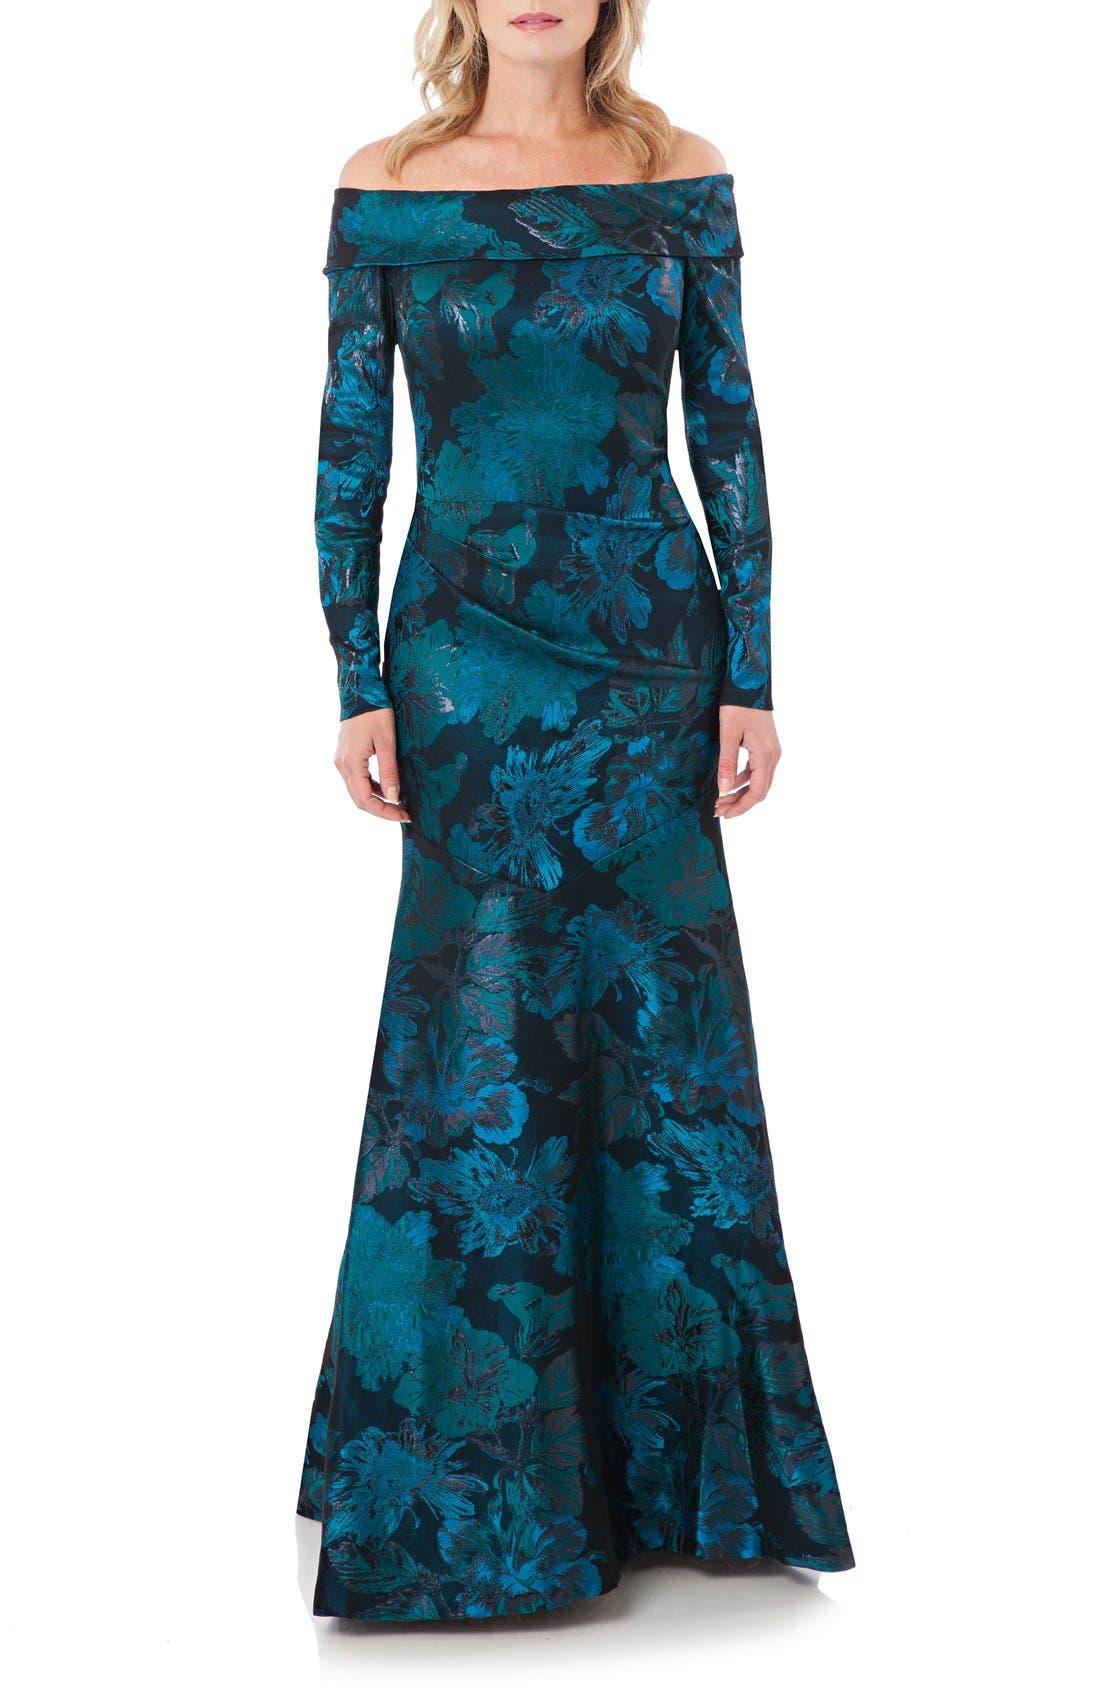 Main Image - Theia Metallic Floral Jacquard Mermaid Gown